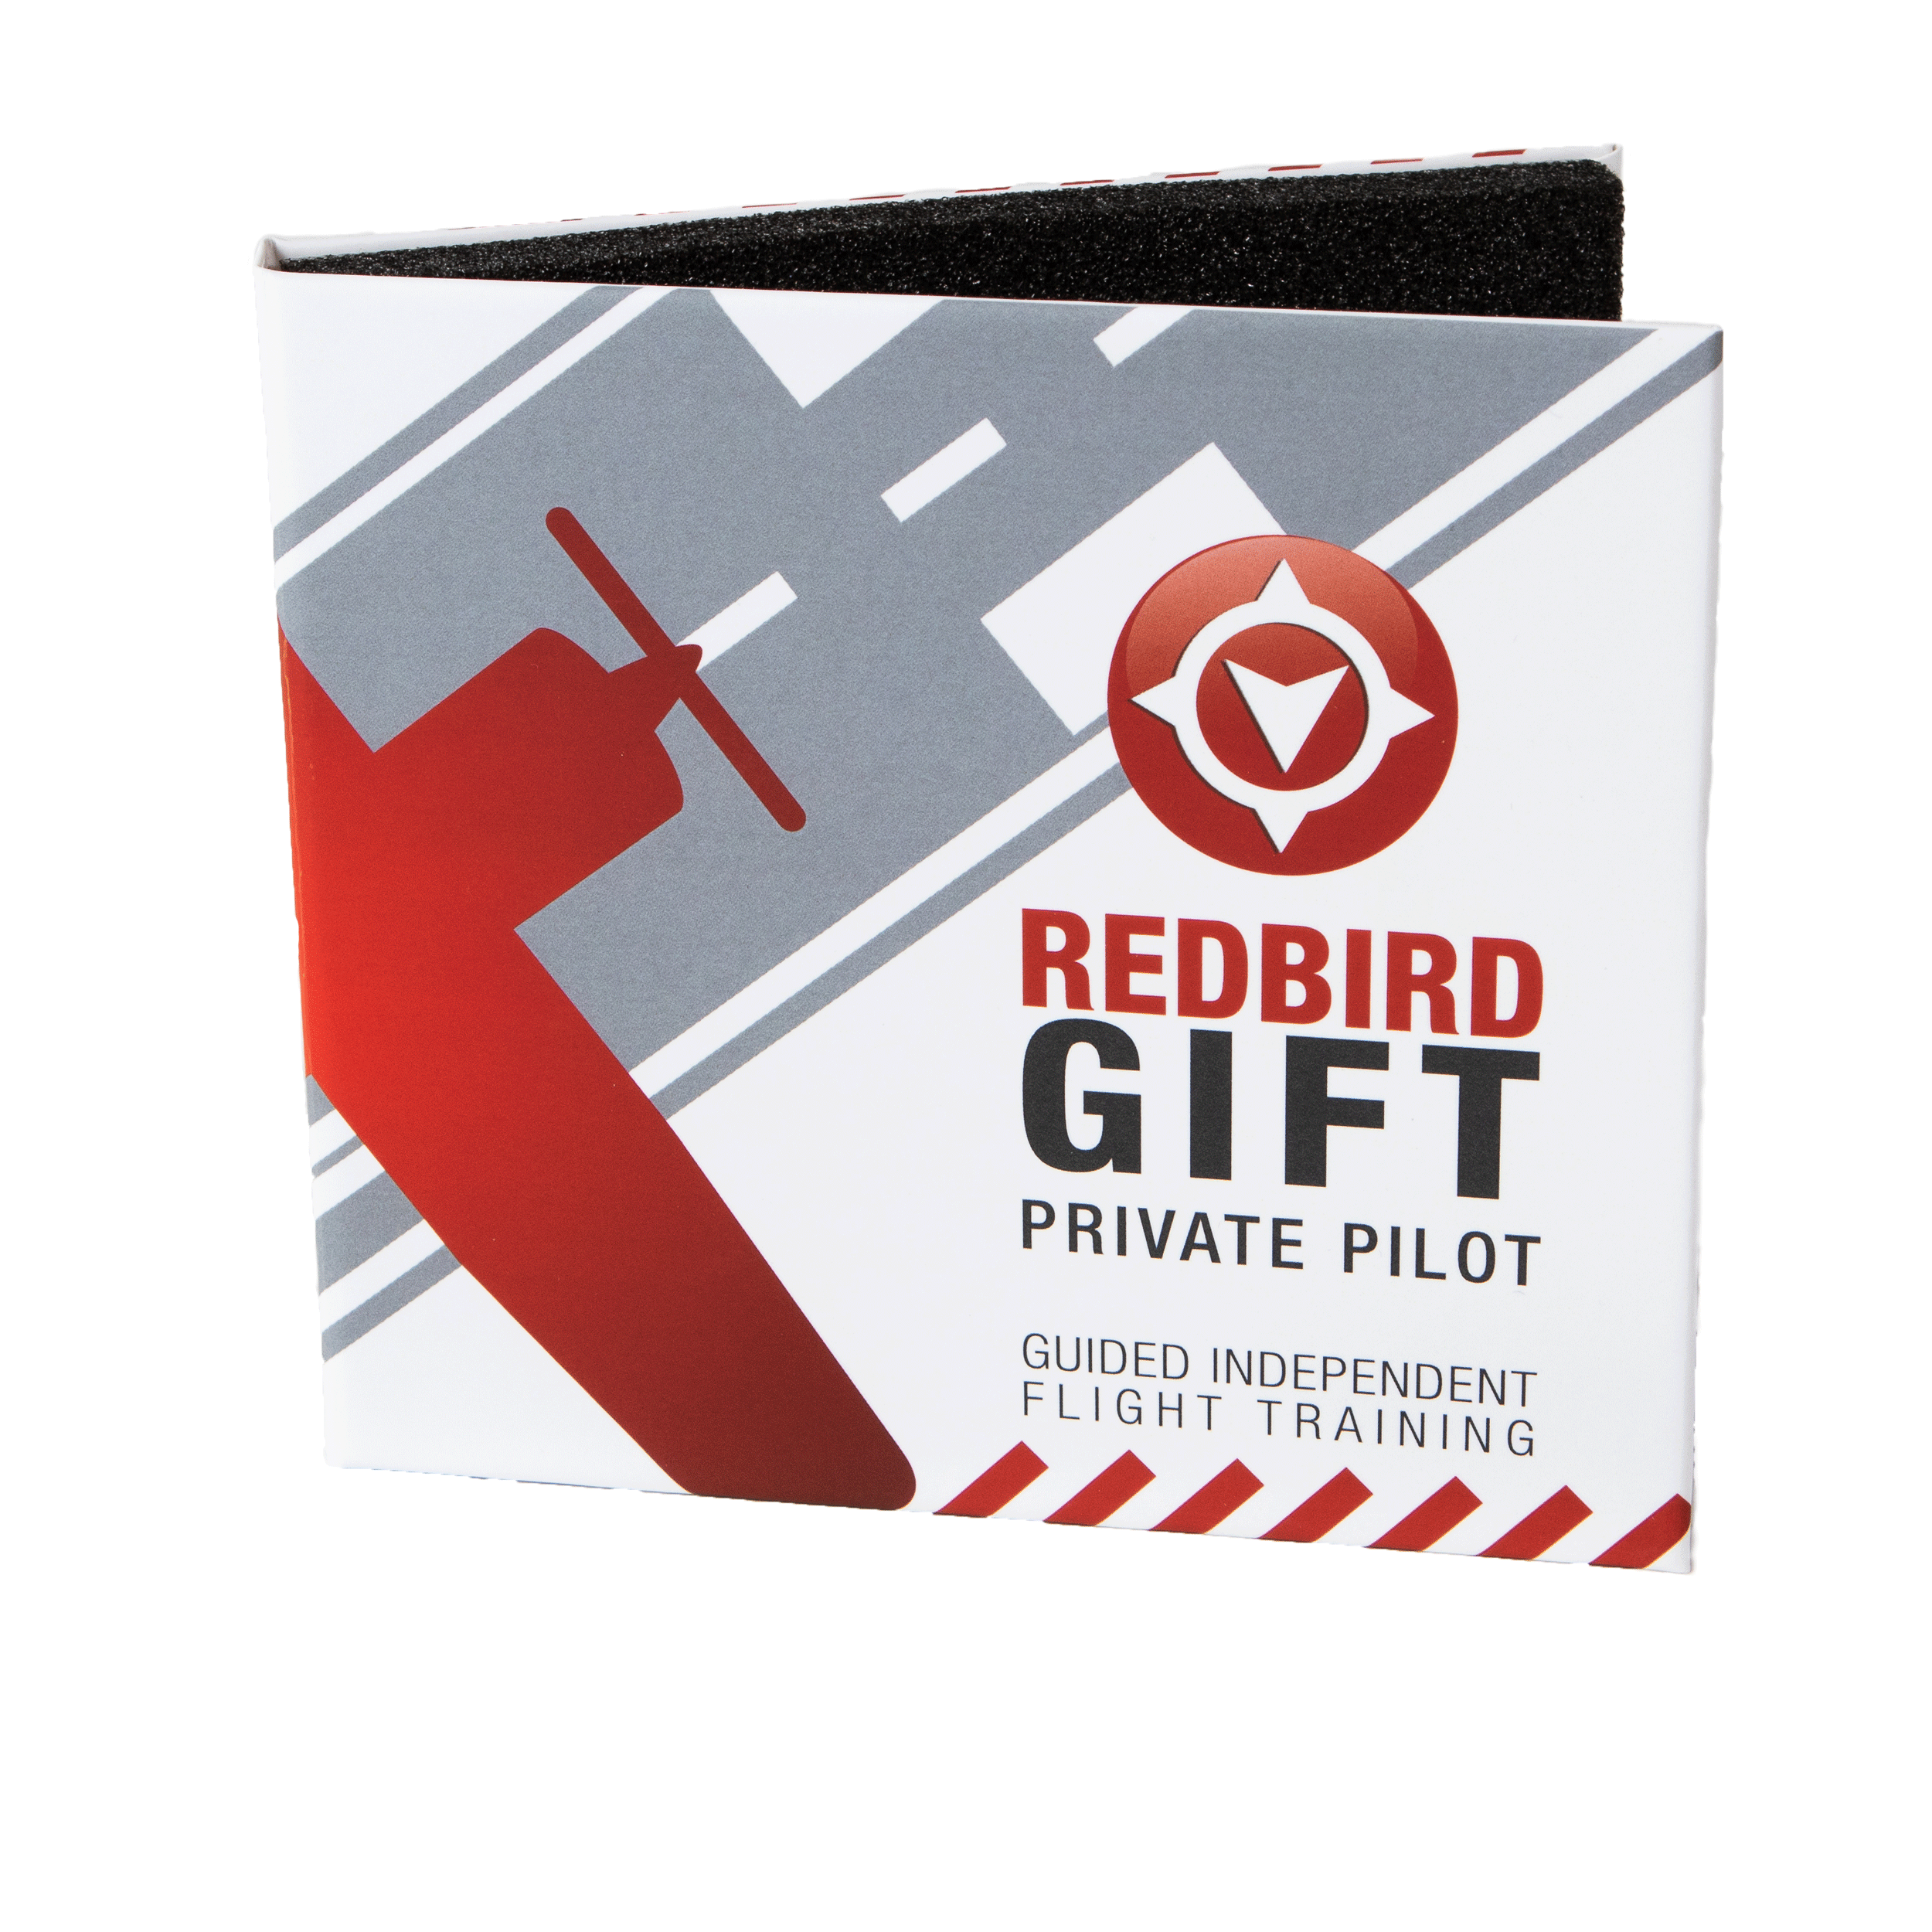 Redbird GIFT for Private Pilot